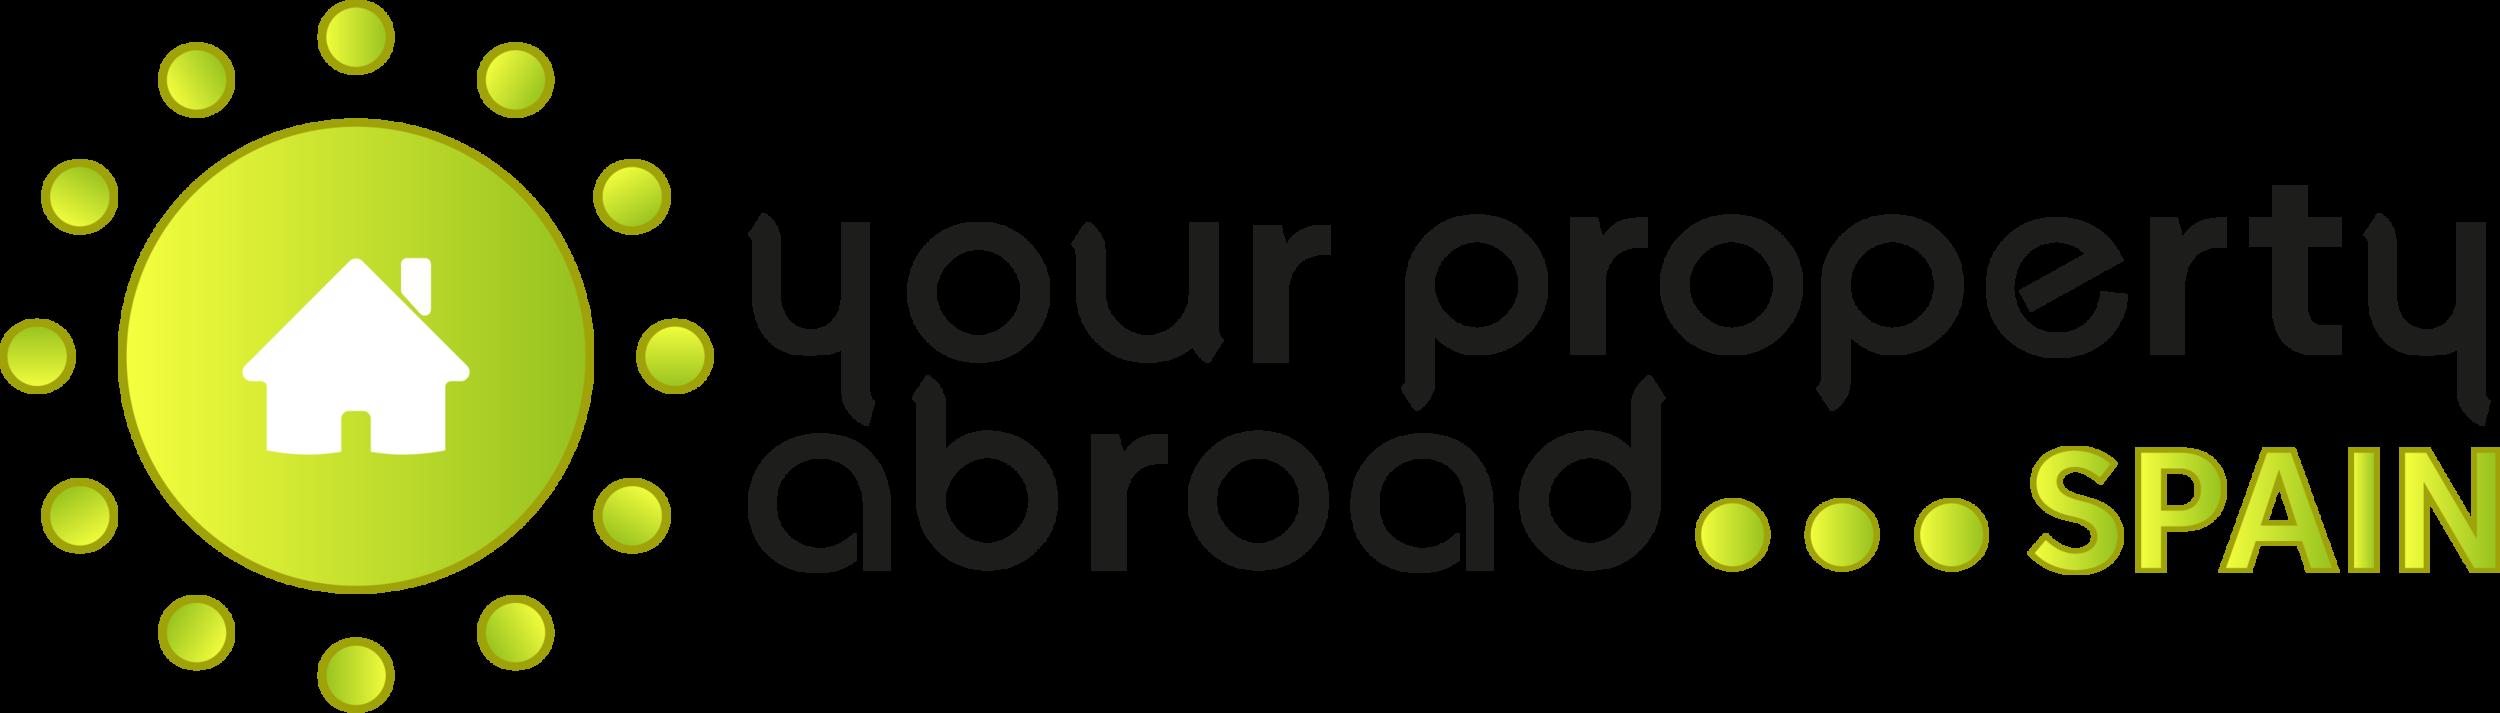 Regional_logo_2.png